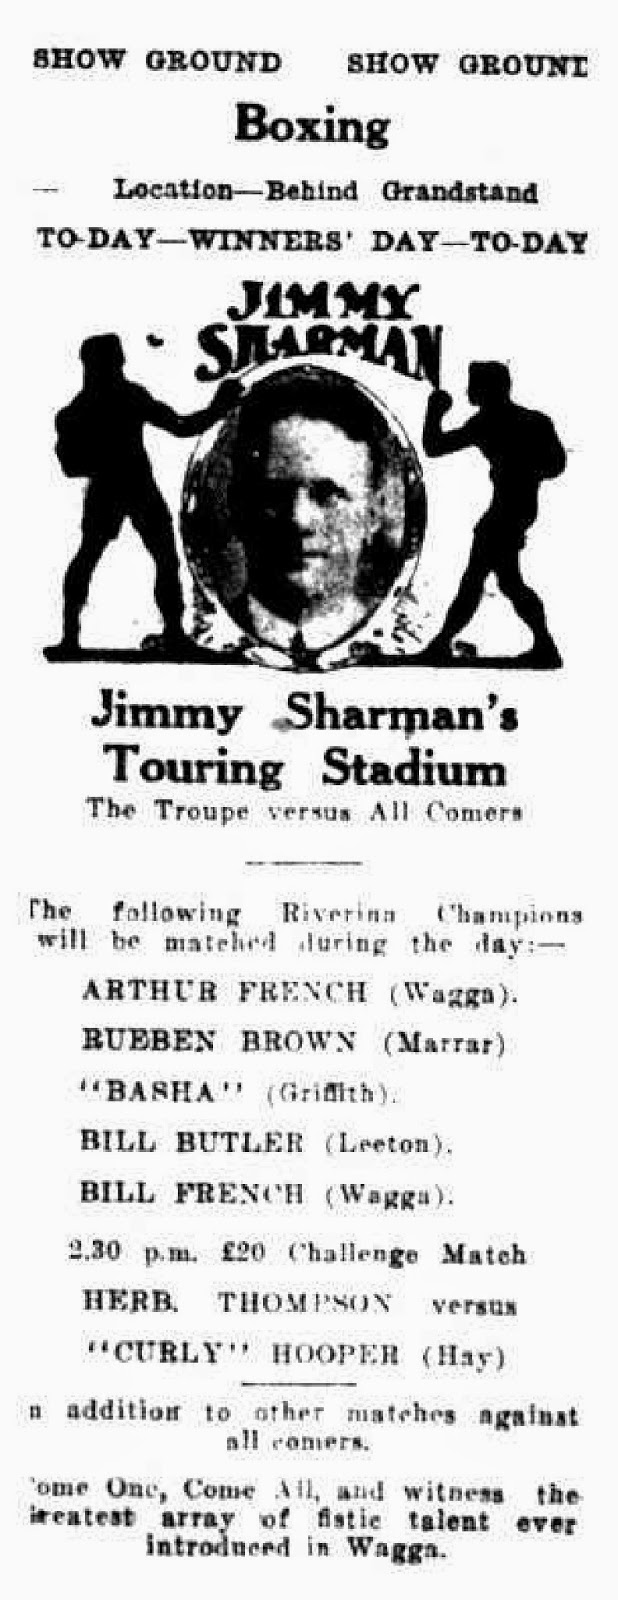 Memories of Wagga Wagga: SHOWTIME! 61st Annual Wagga Show